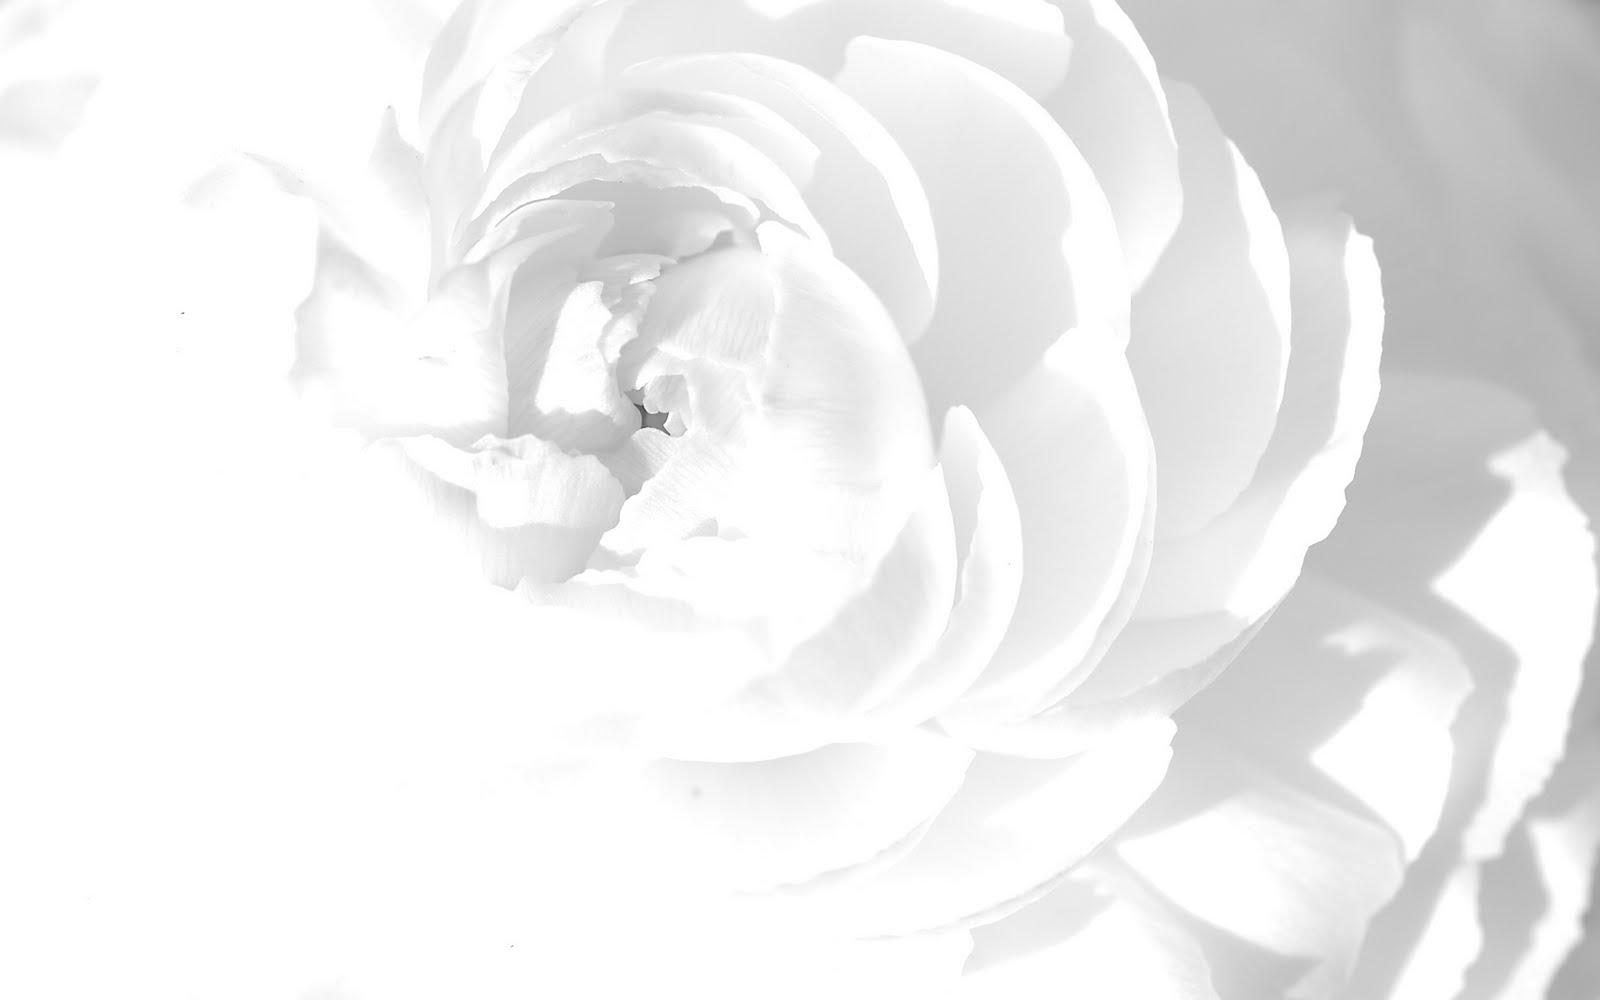 White flowers wallpaper photography hd 4776 wallpaper walldiskpaper white flowers wallpaper photography hd mightylinksfo